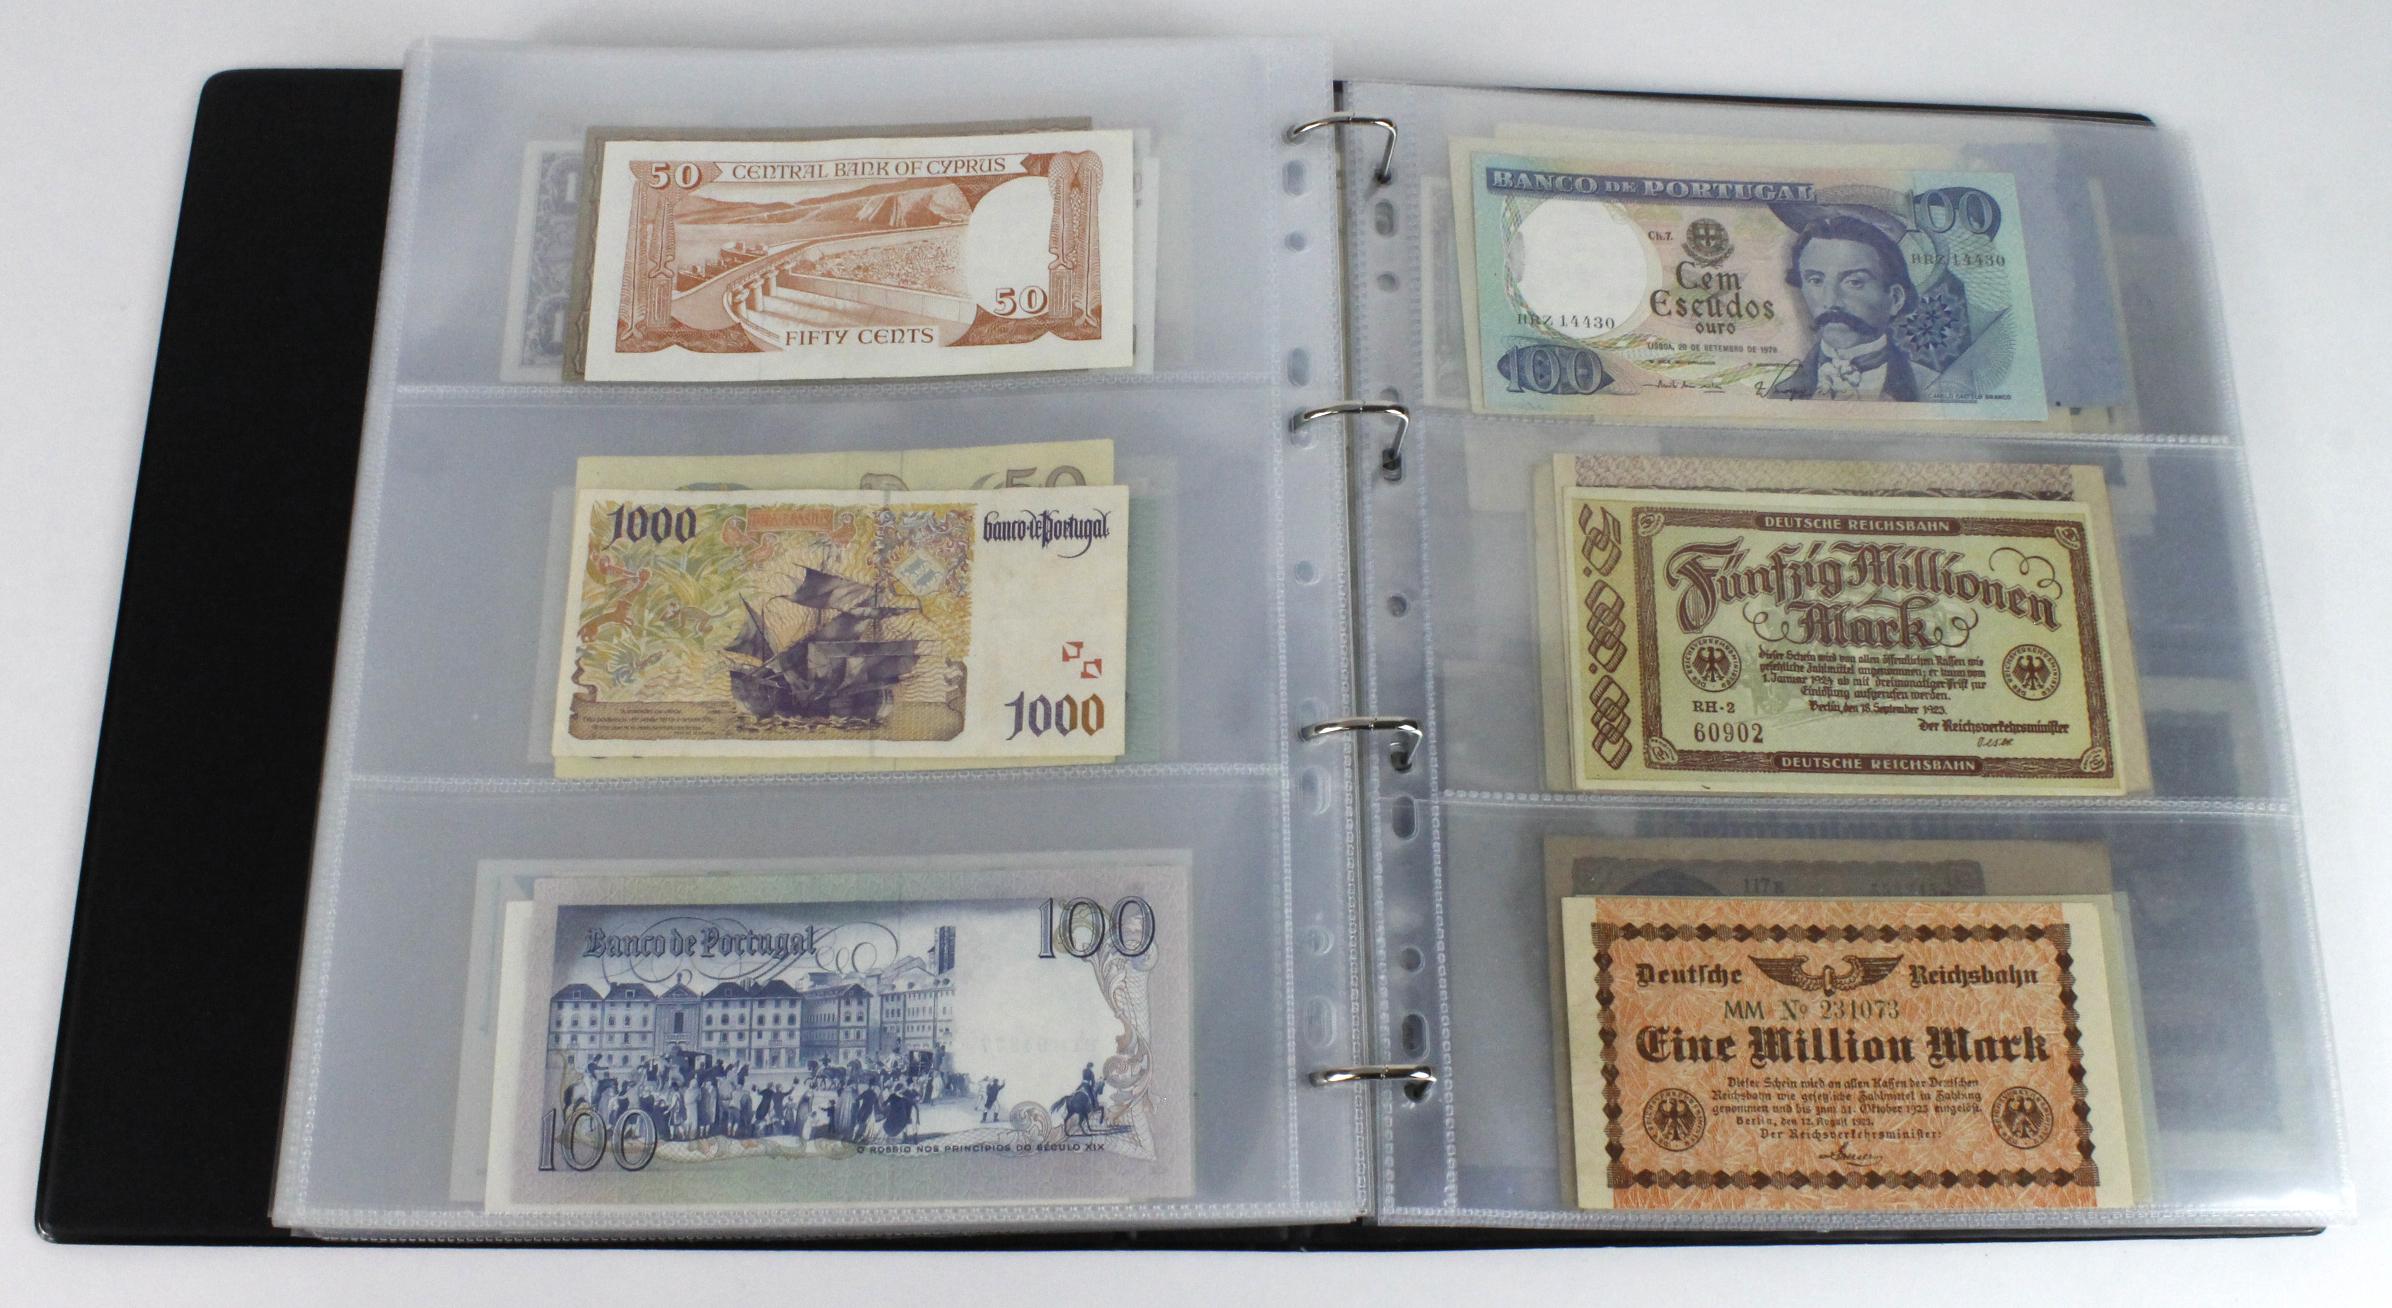 World (163), in banknote album including Bahamas, Spain, Sweden, Netherlands, Algeria, Macau, - Image 48 of 57